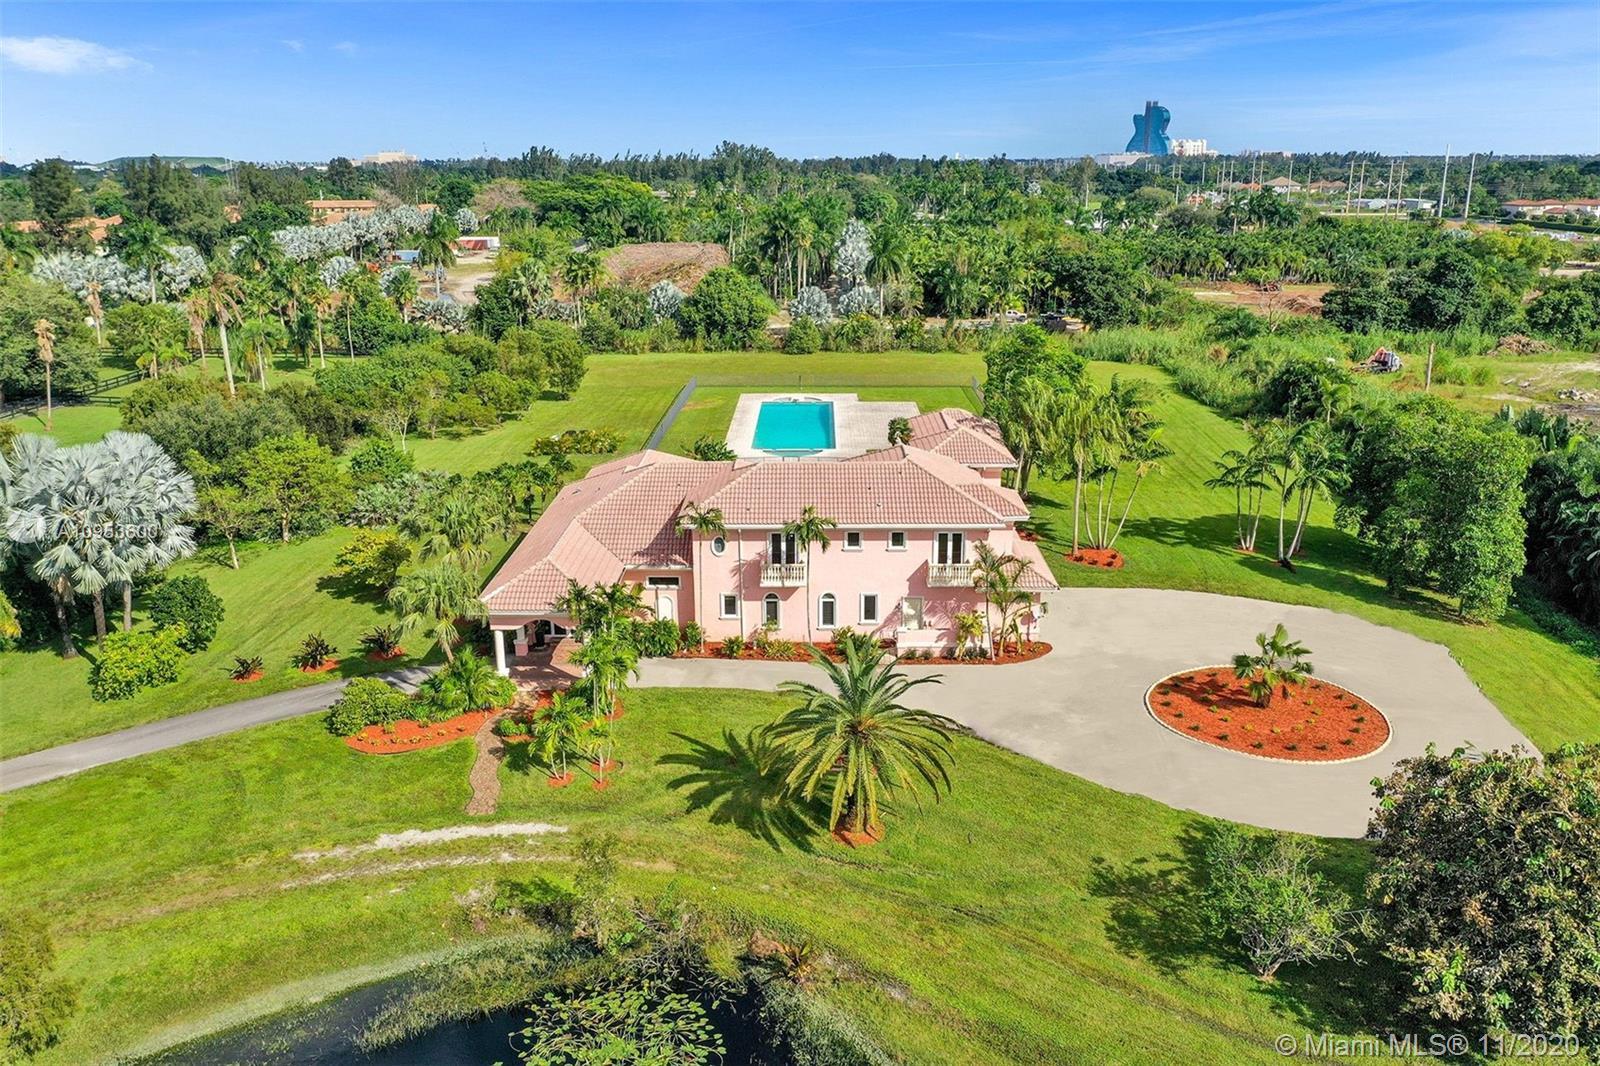 Everglade Land Sales, 5100 SW 70th Ave, Davie, Florida 33314